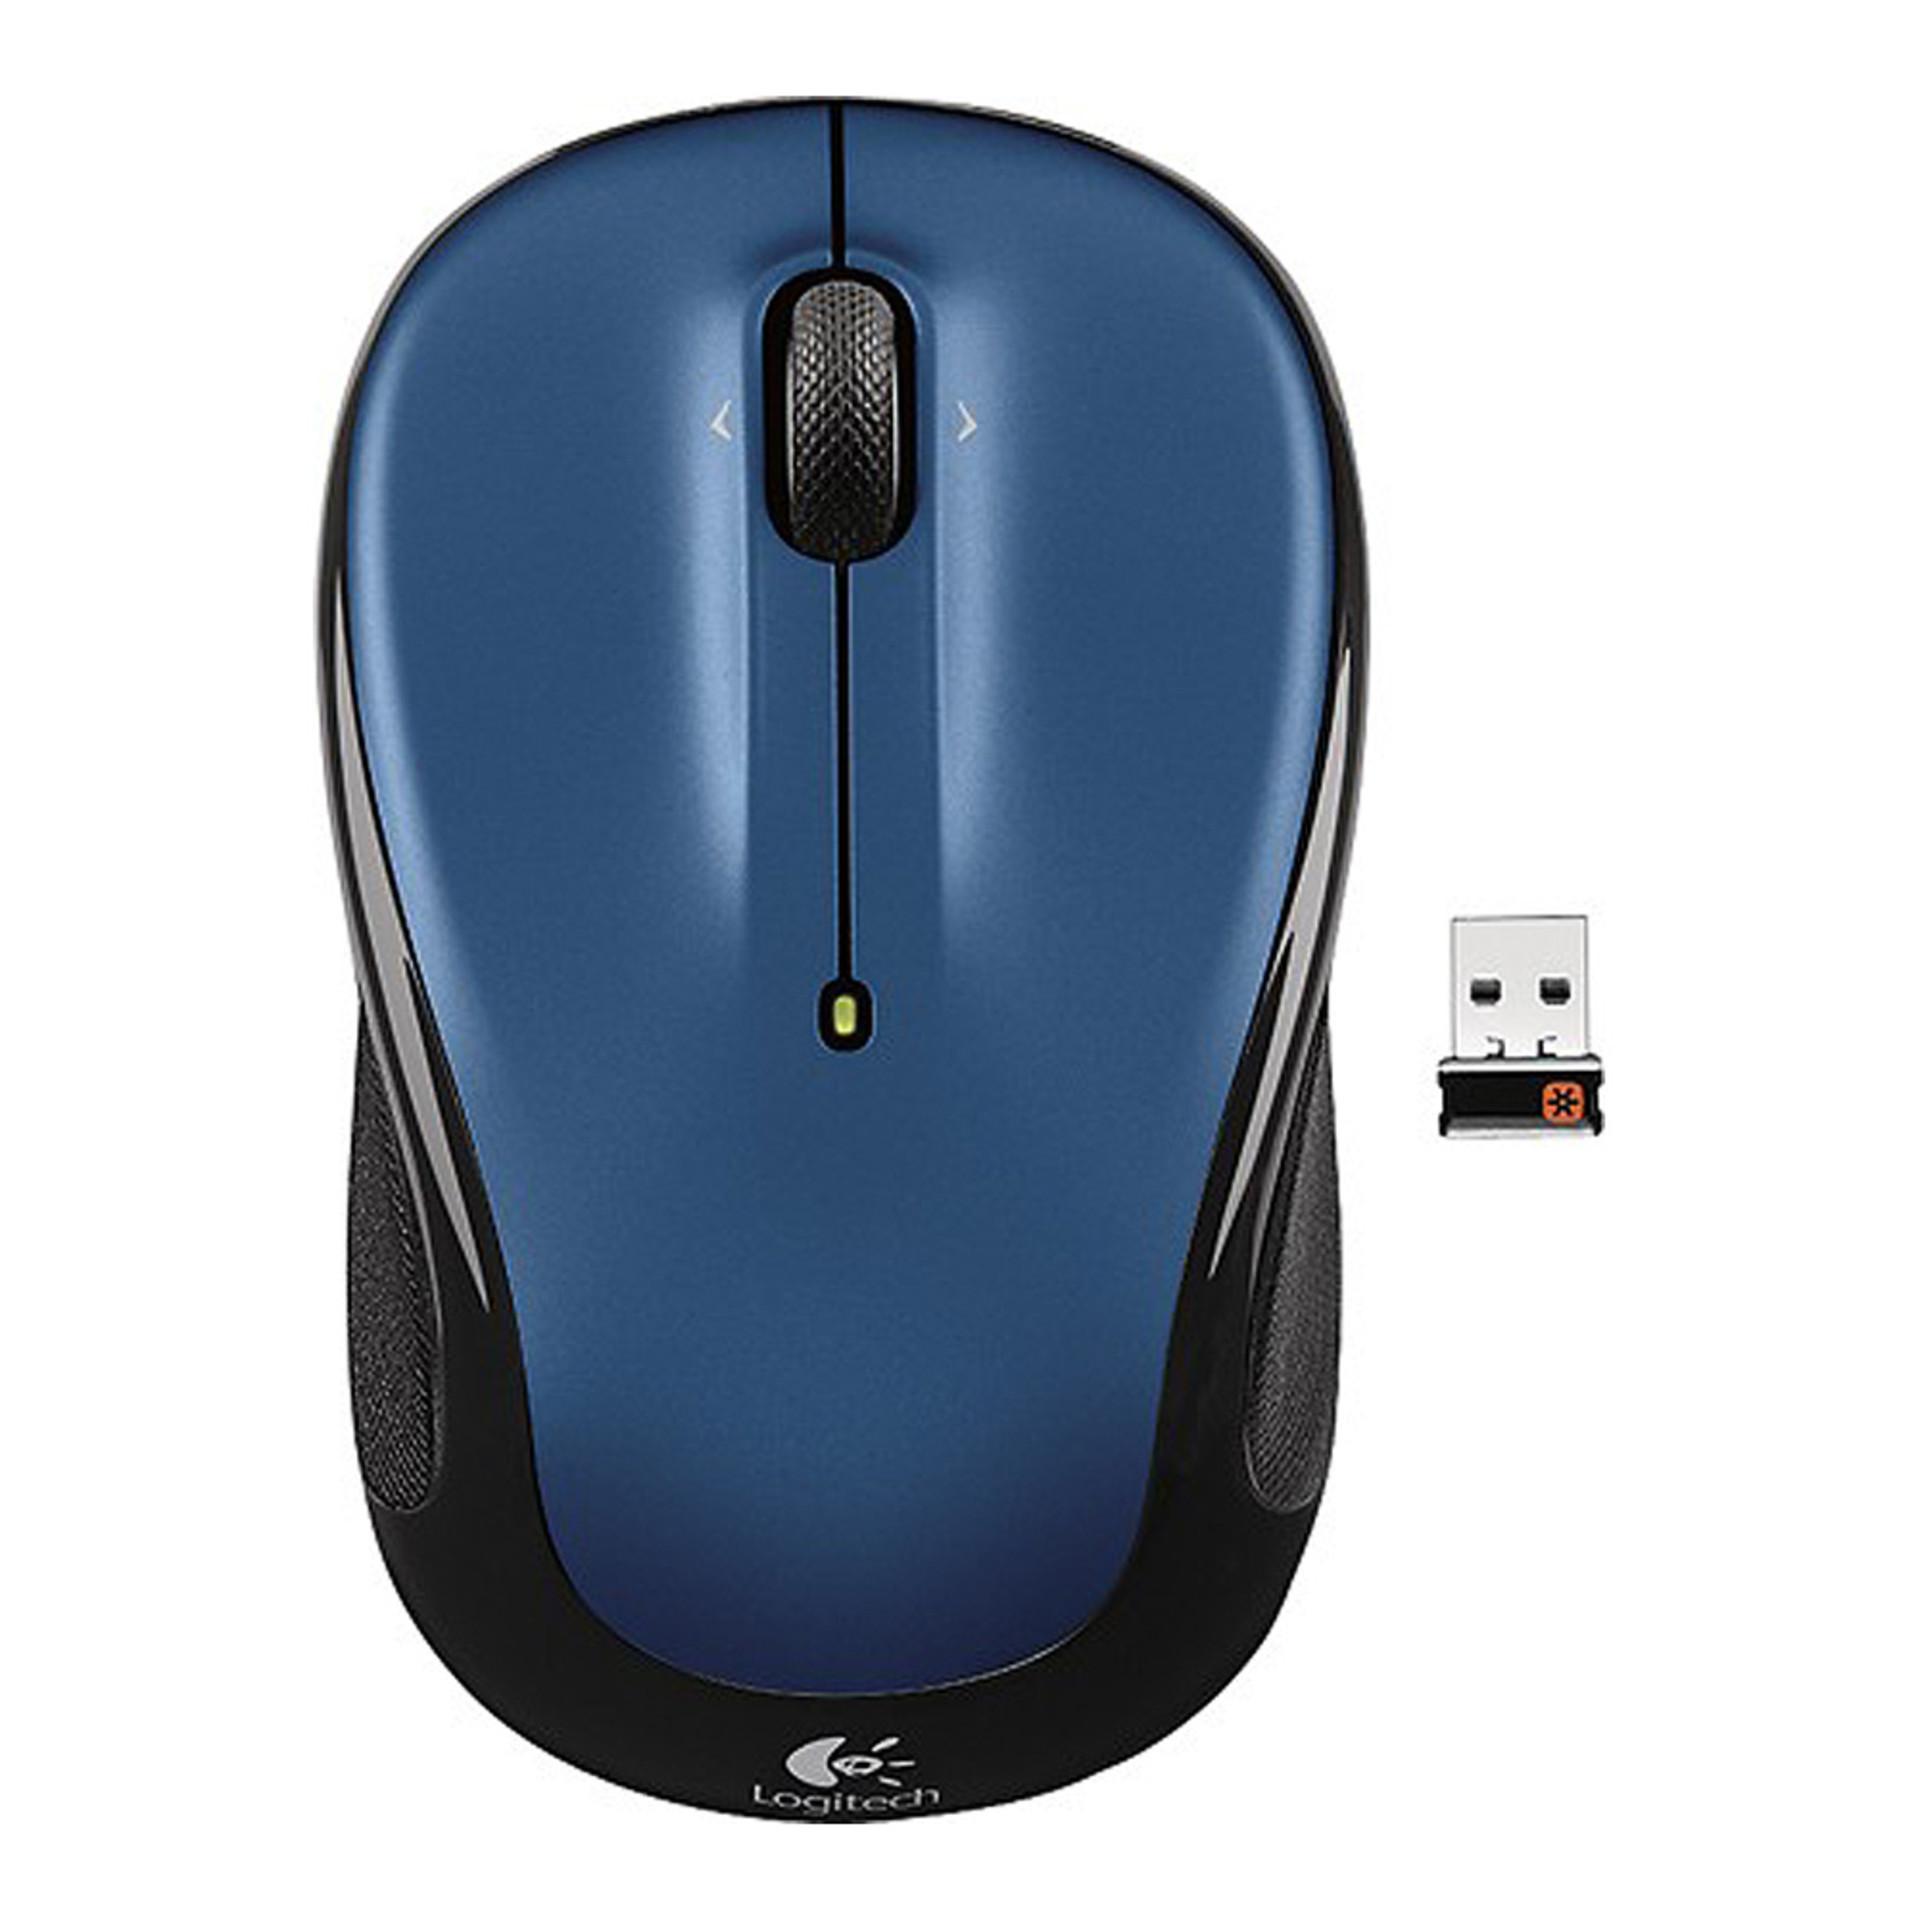 Logitech M325 Wireless Mouse Blue